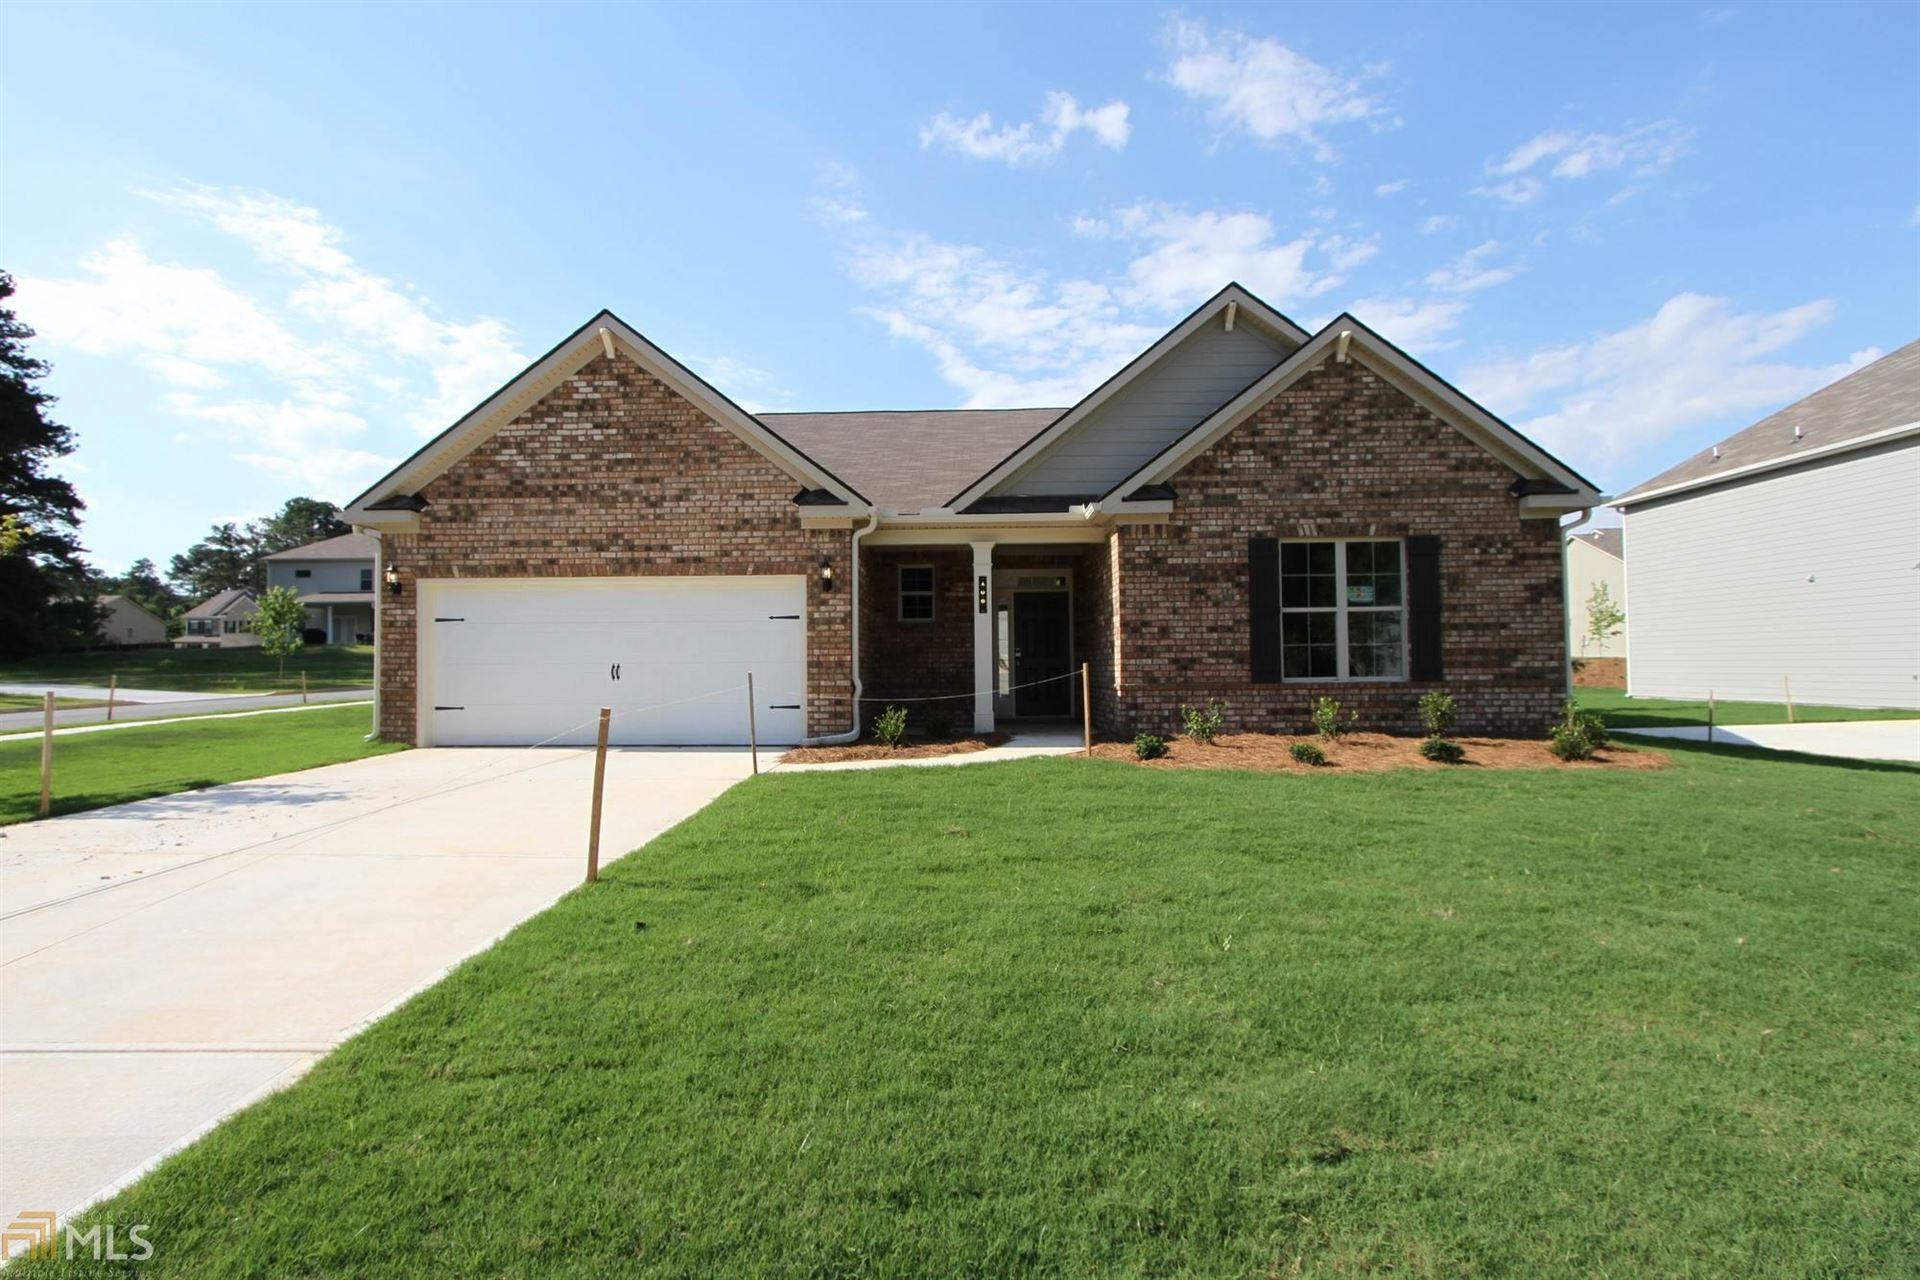 137 Rolling Hills Pl, Canton, GA 30114 - MLS#: 8863918